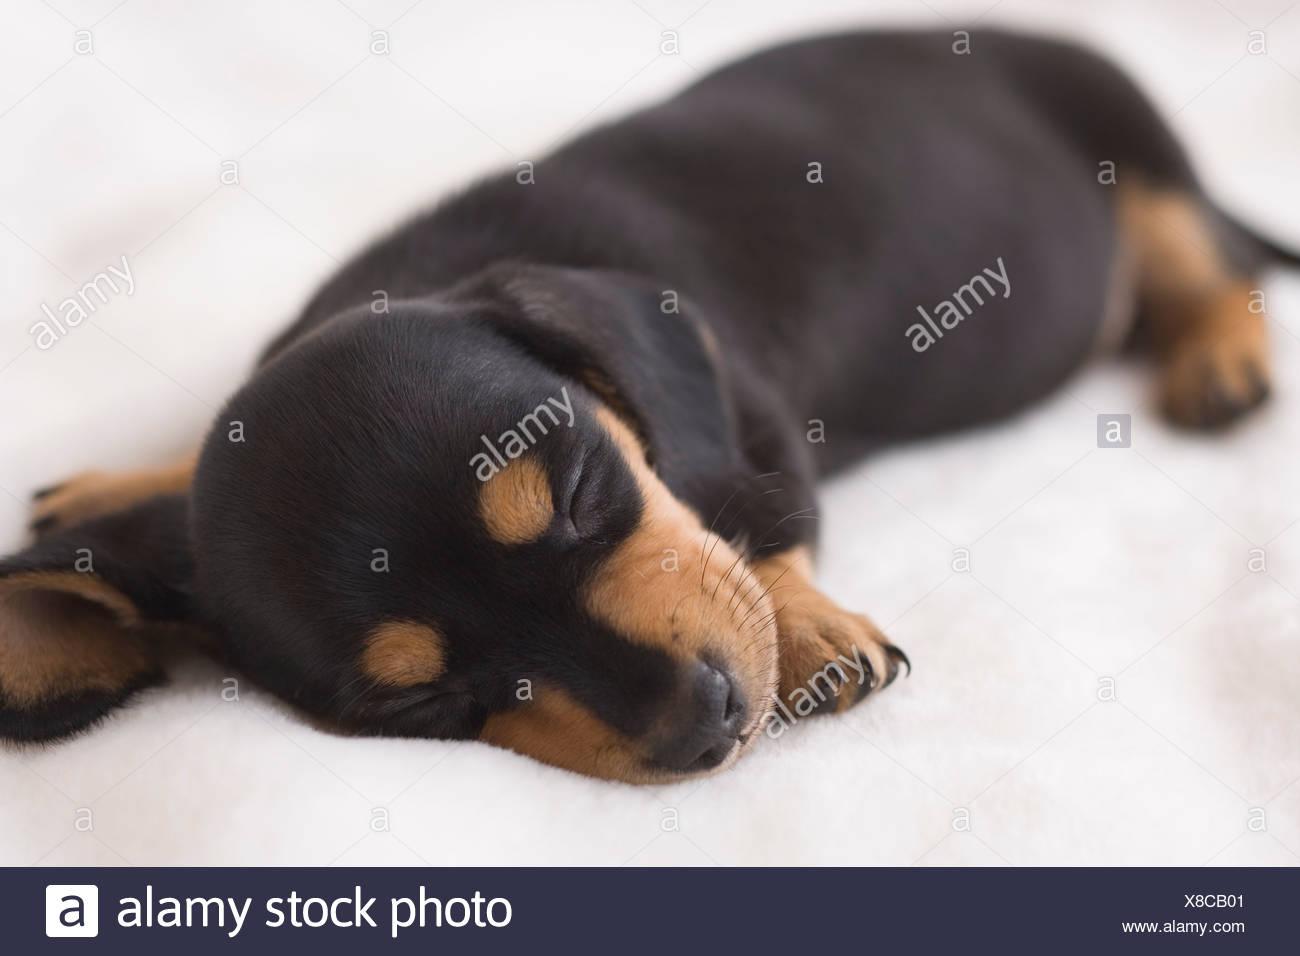 Miniature dachshund sleeping on a blanket - Stock Image